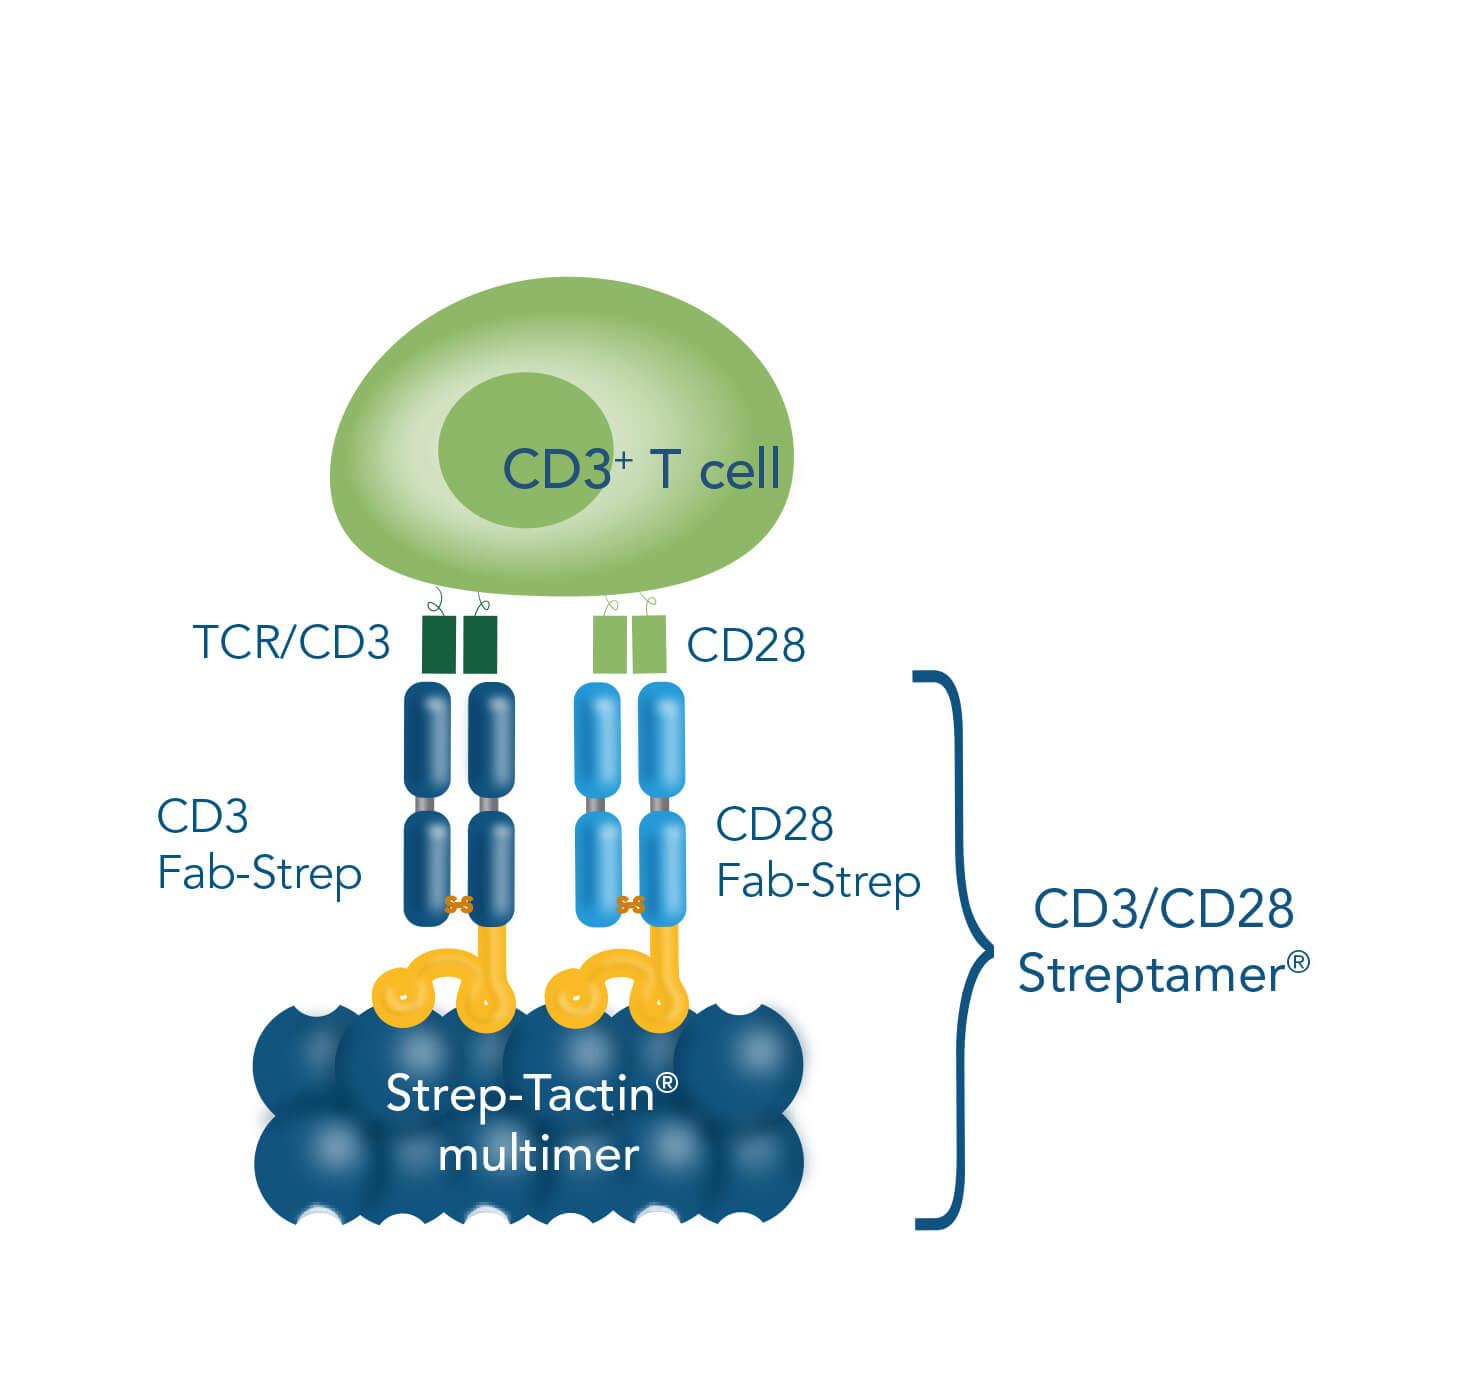 Methods for T cell stimulation & expansion CD3/CD28 Streptamer